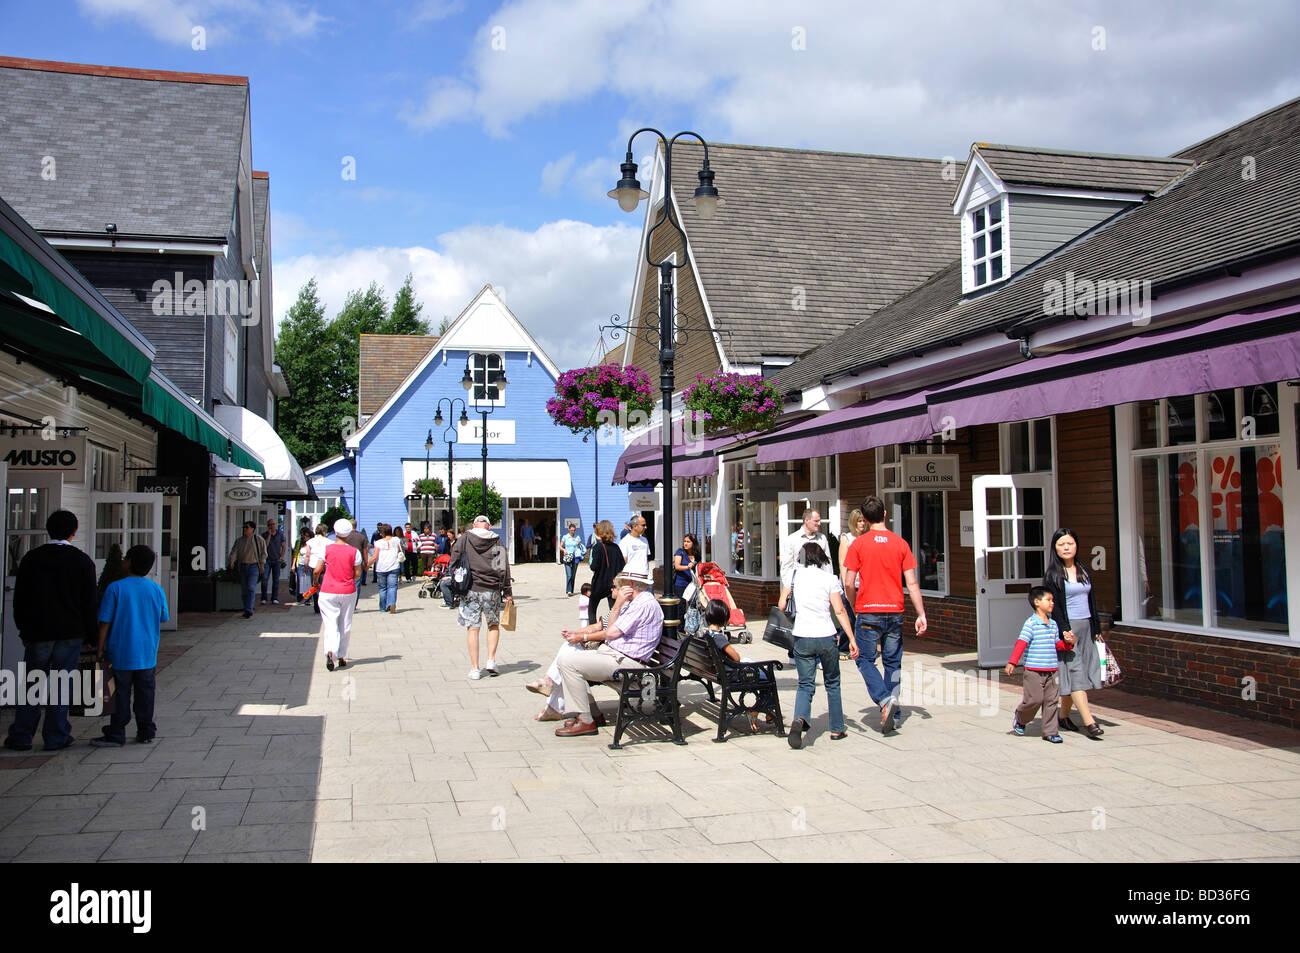 Bicester Village Shopping Centre, Bicester, Oxfordshire, England, United Kingdom - Stock Image